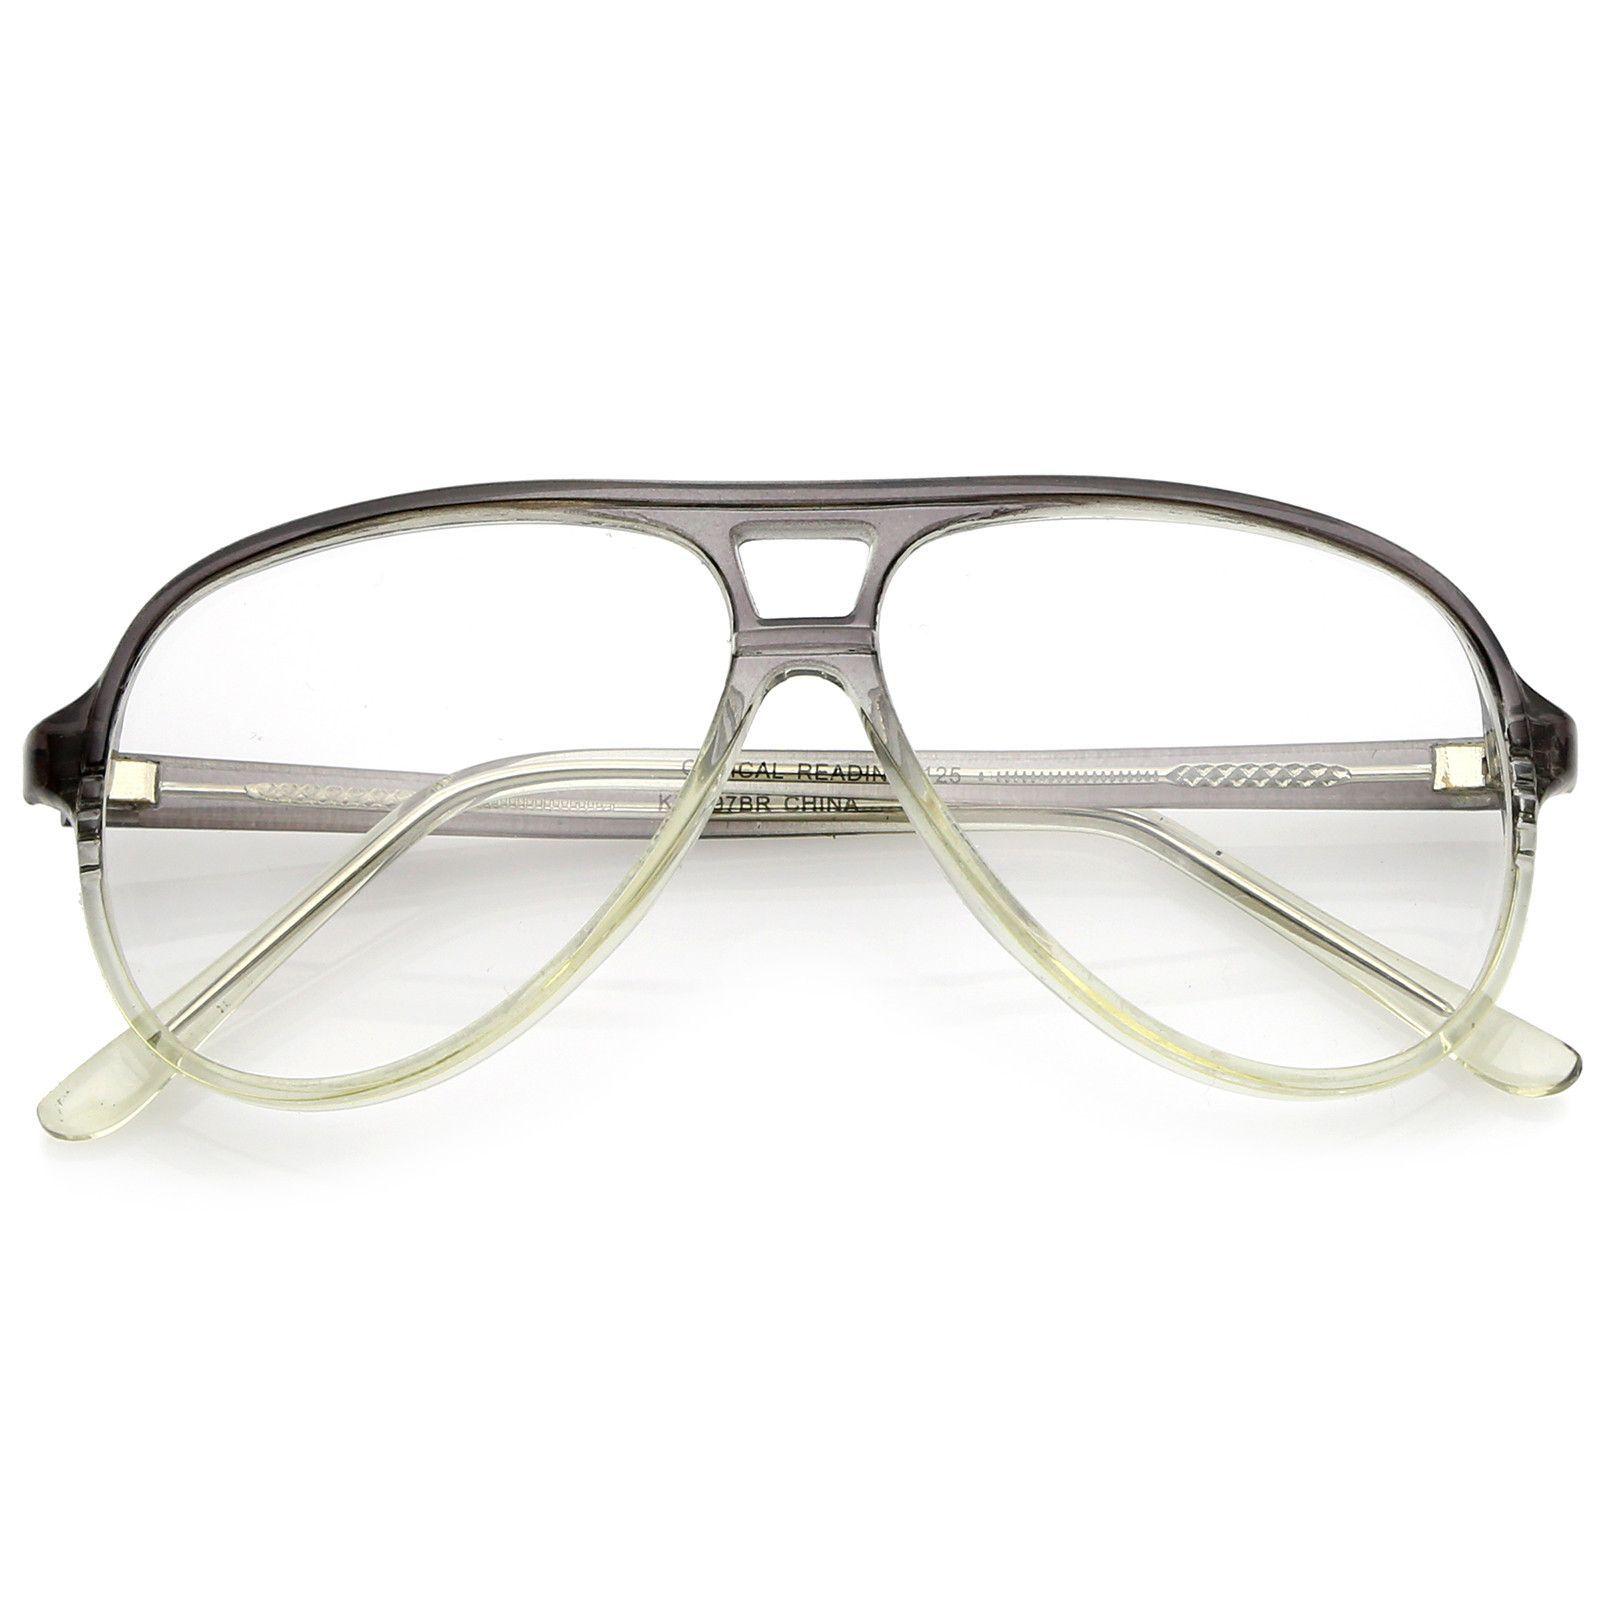 RETRO AVIATOR GLASSES CLEAR LENS Choose Translucent Frame HIPSTER Vintage Style